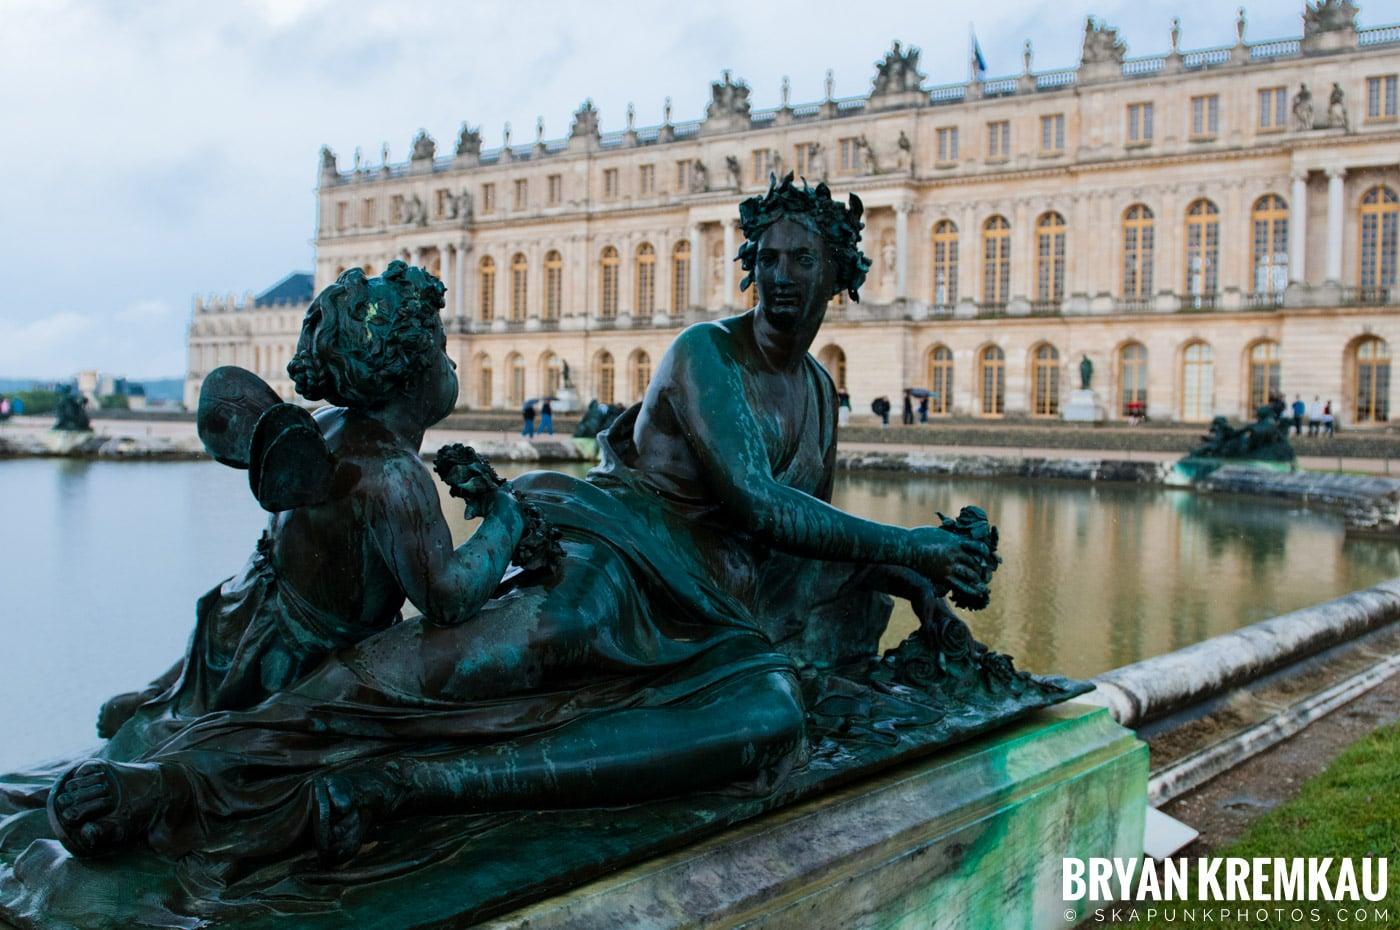 Paris, France Honeymoon - Day 2 - 7.19.11 (15)